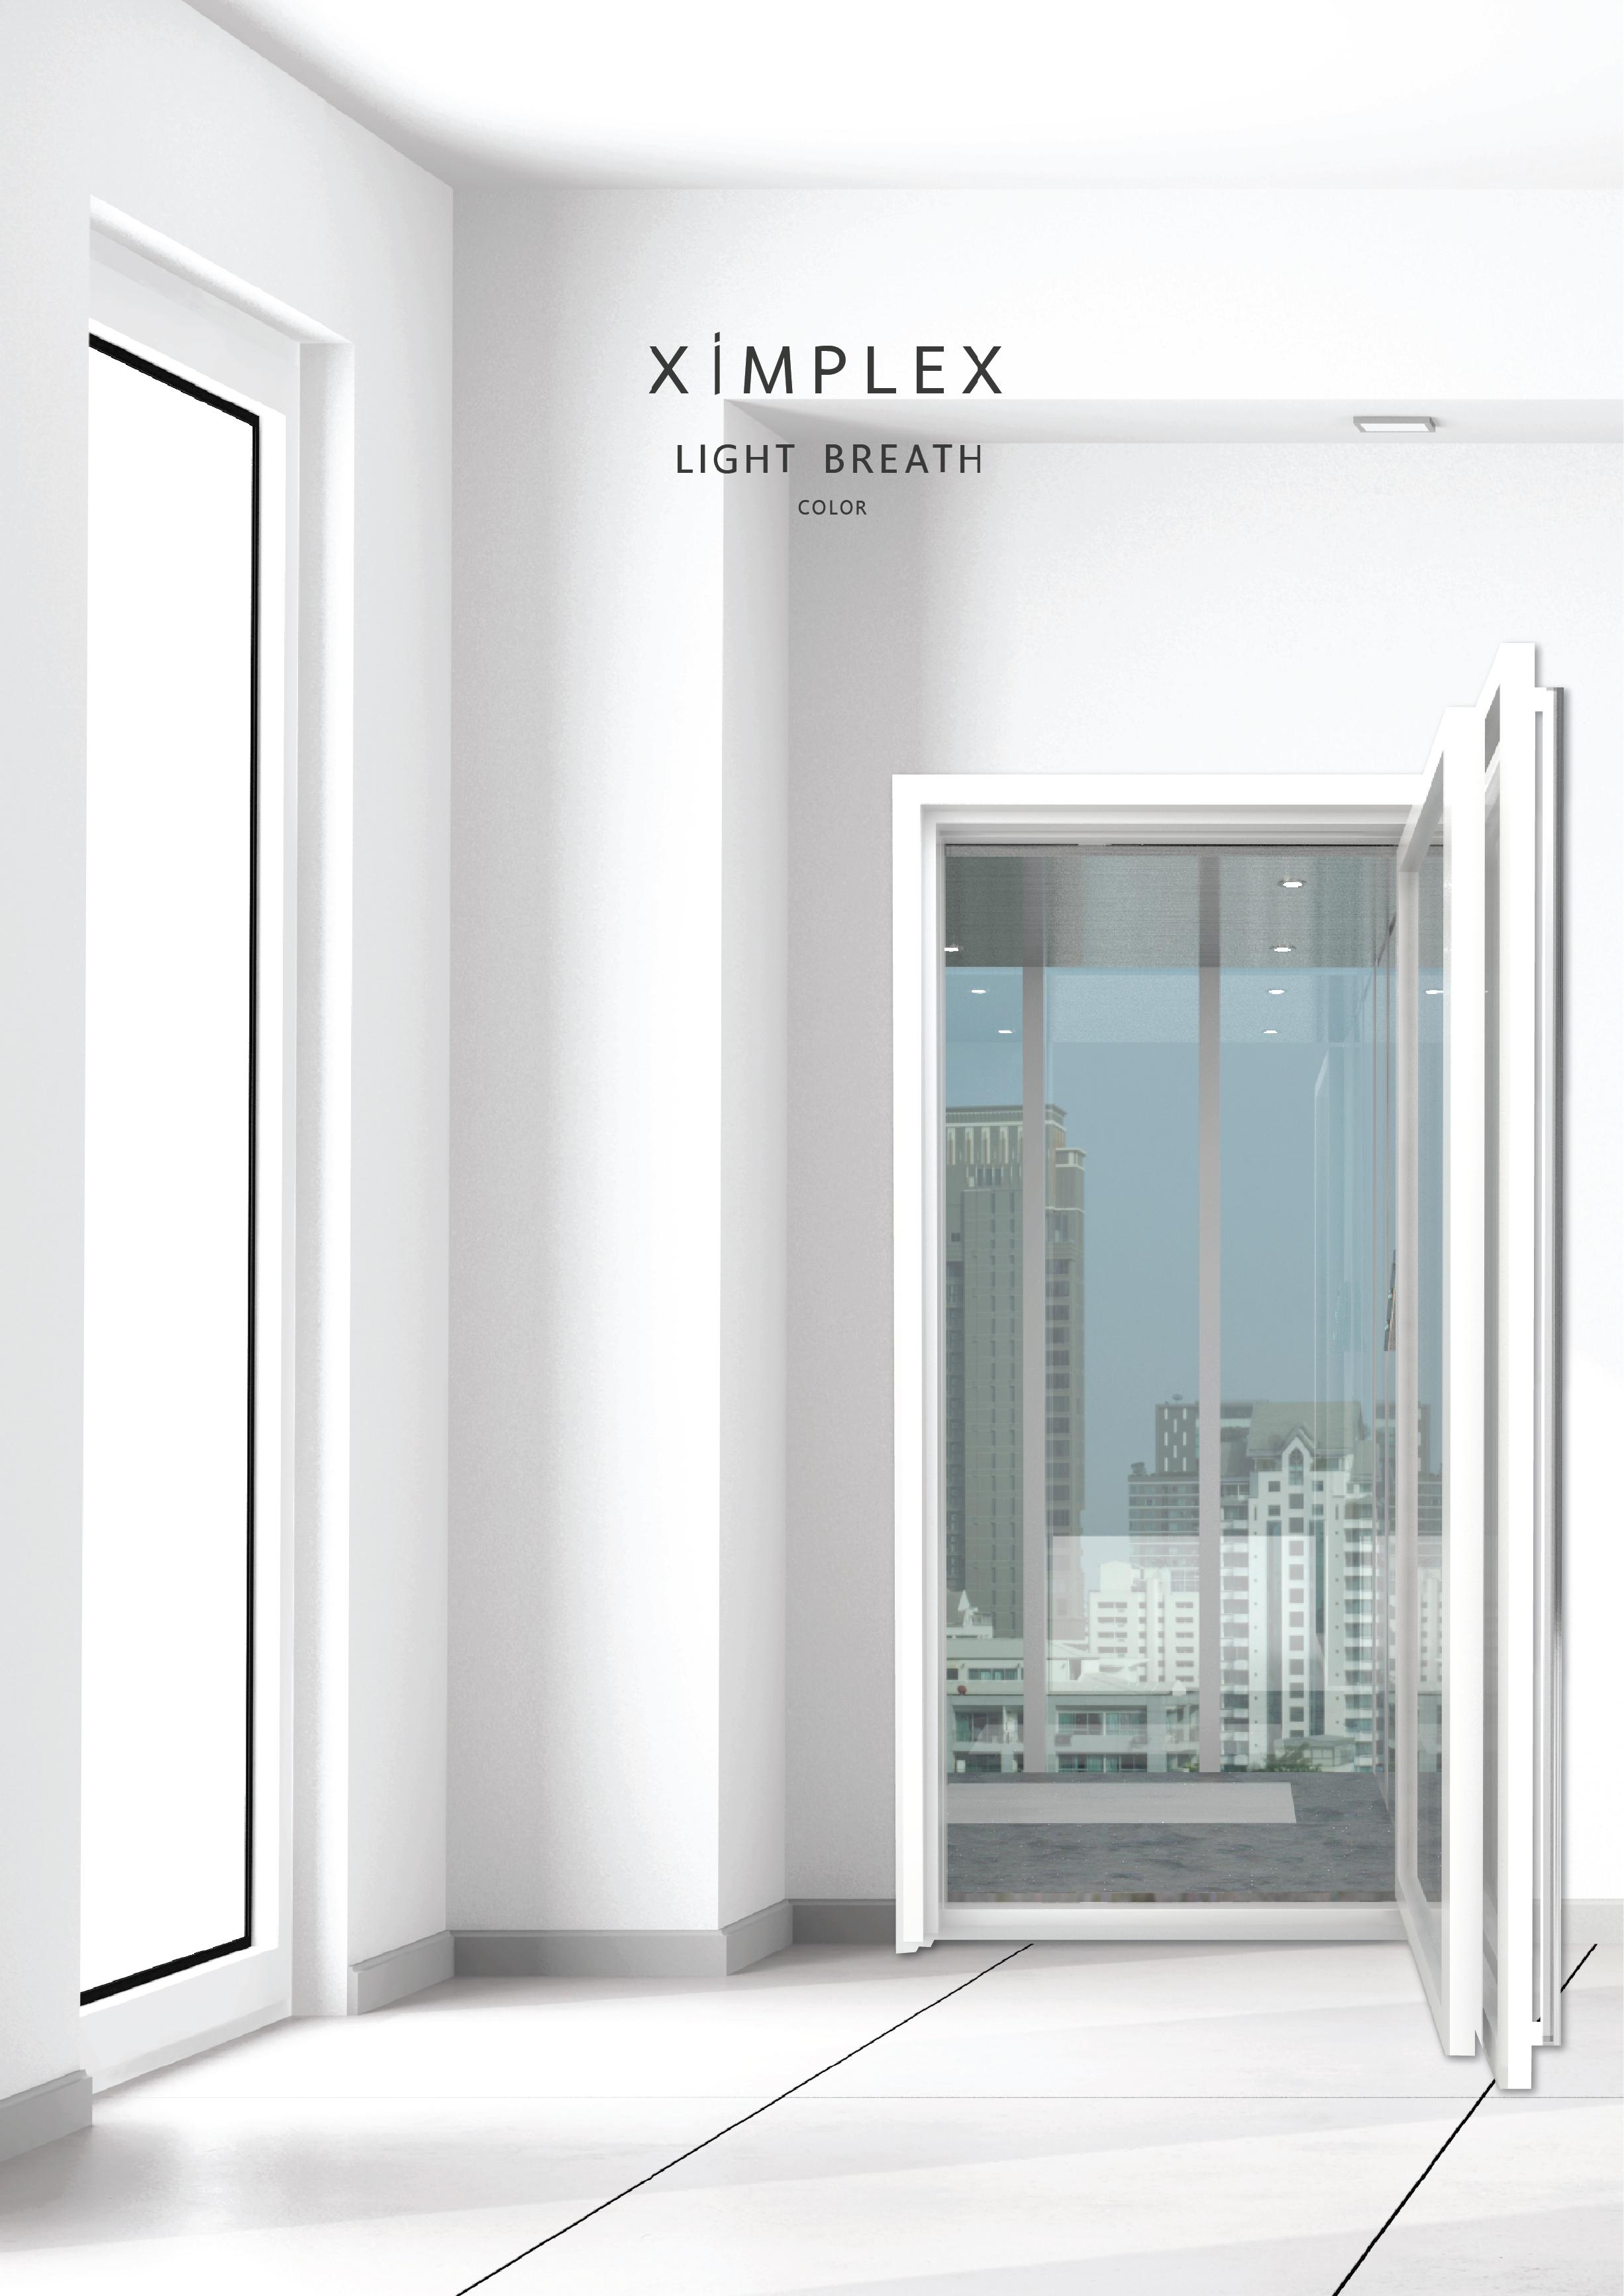 Ximplex Home Lift Home Elevator Ximplex ลิฟต์บ้าน ลิฟท์บ้าน Light breath design